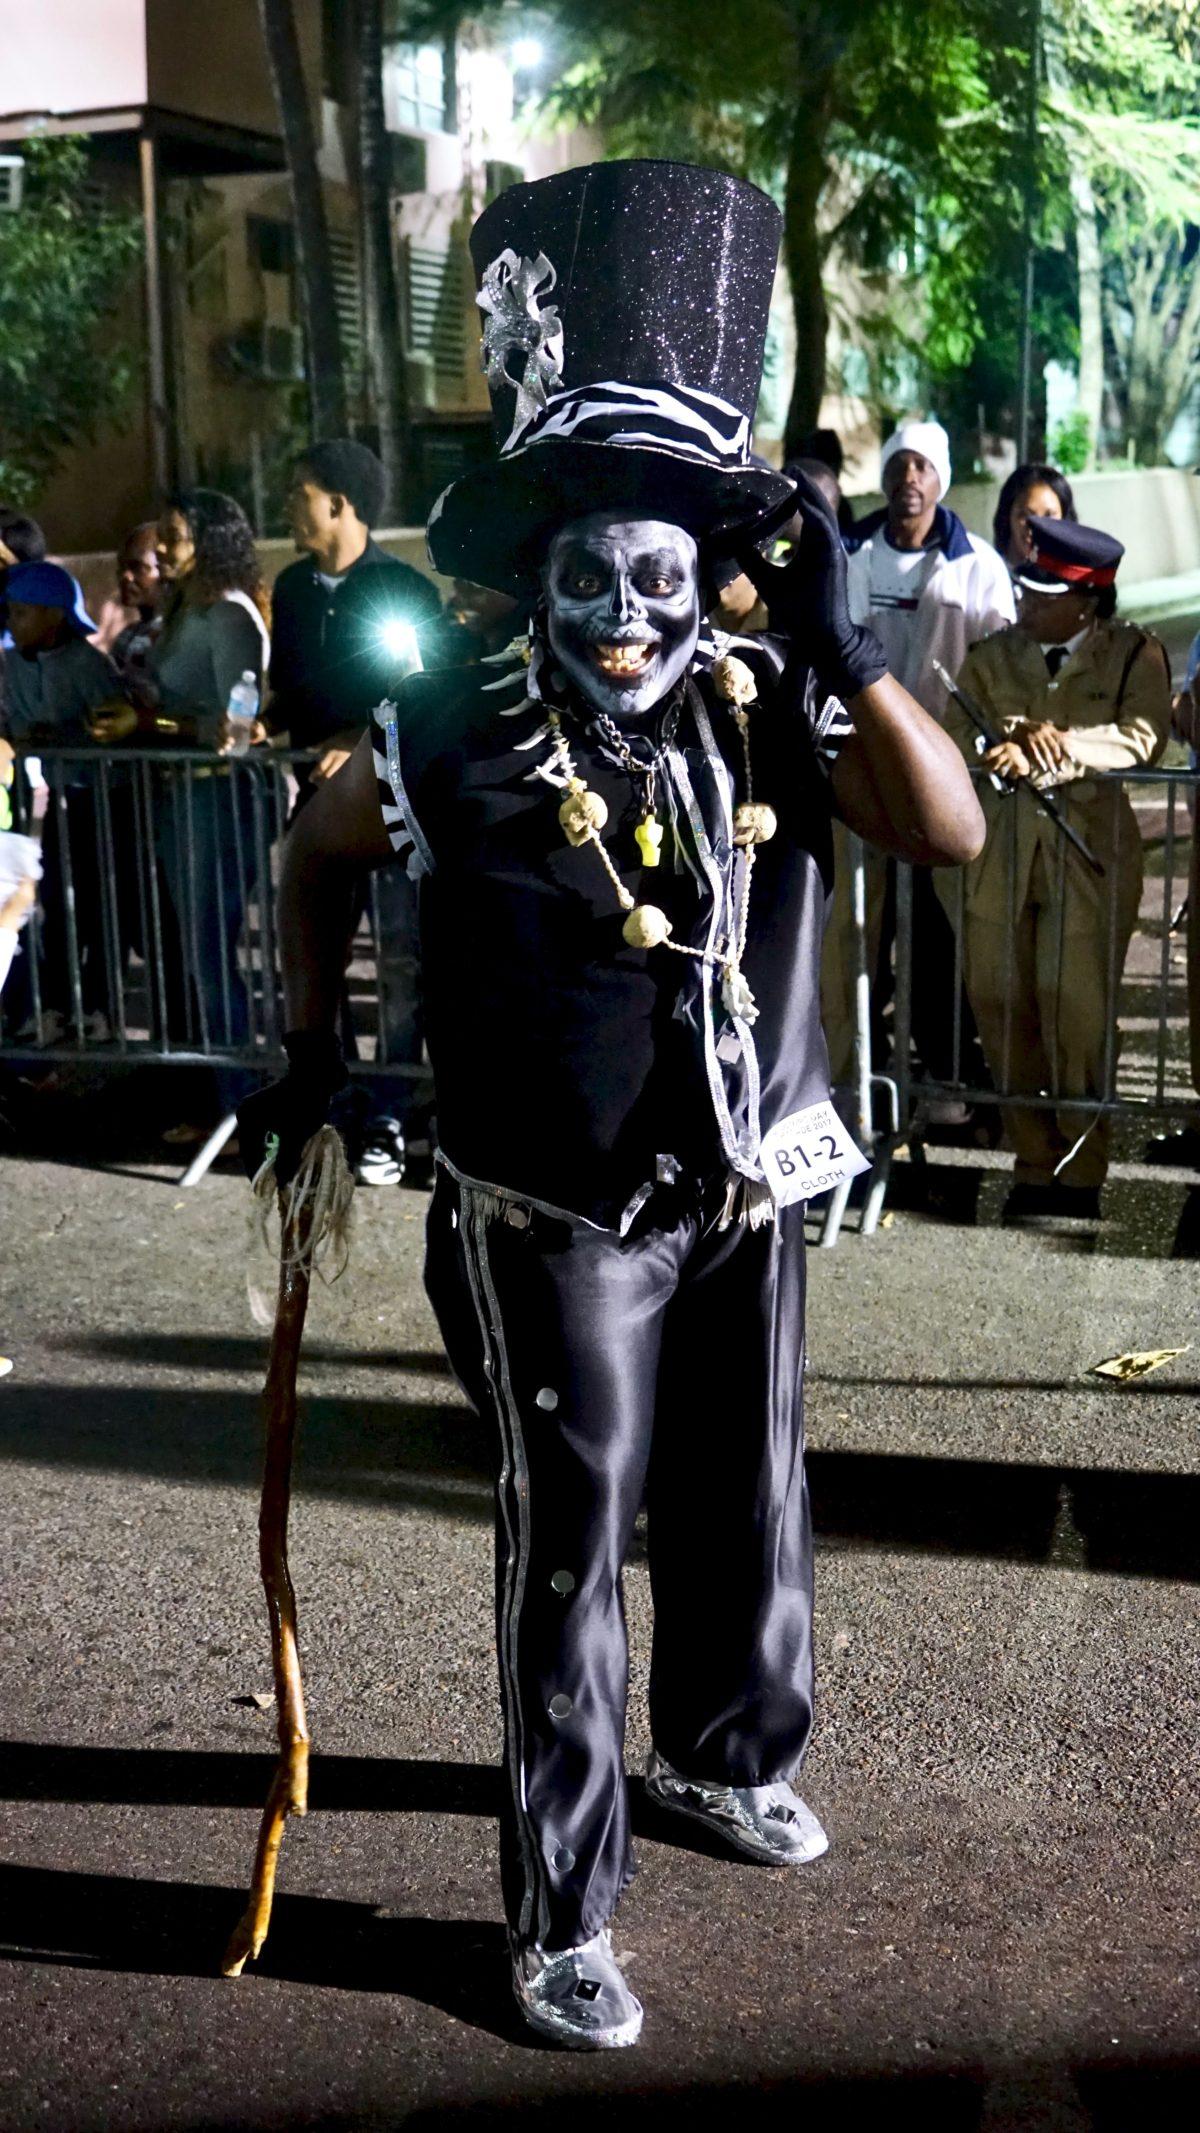 carnaval-junkanoo-bahamas-nassau-caraibes-monsieurmada.me-magazine-voyage-lestendancesdelilou-boris-deltell-sorryofrmyfrench-travel-photography